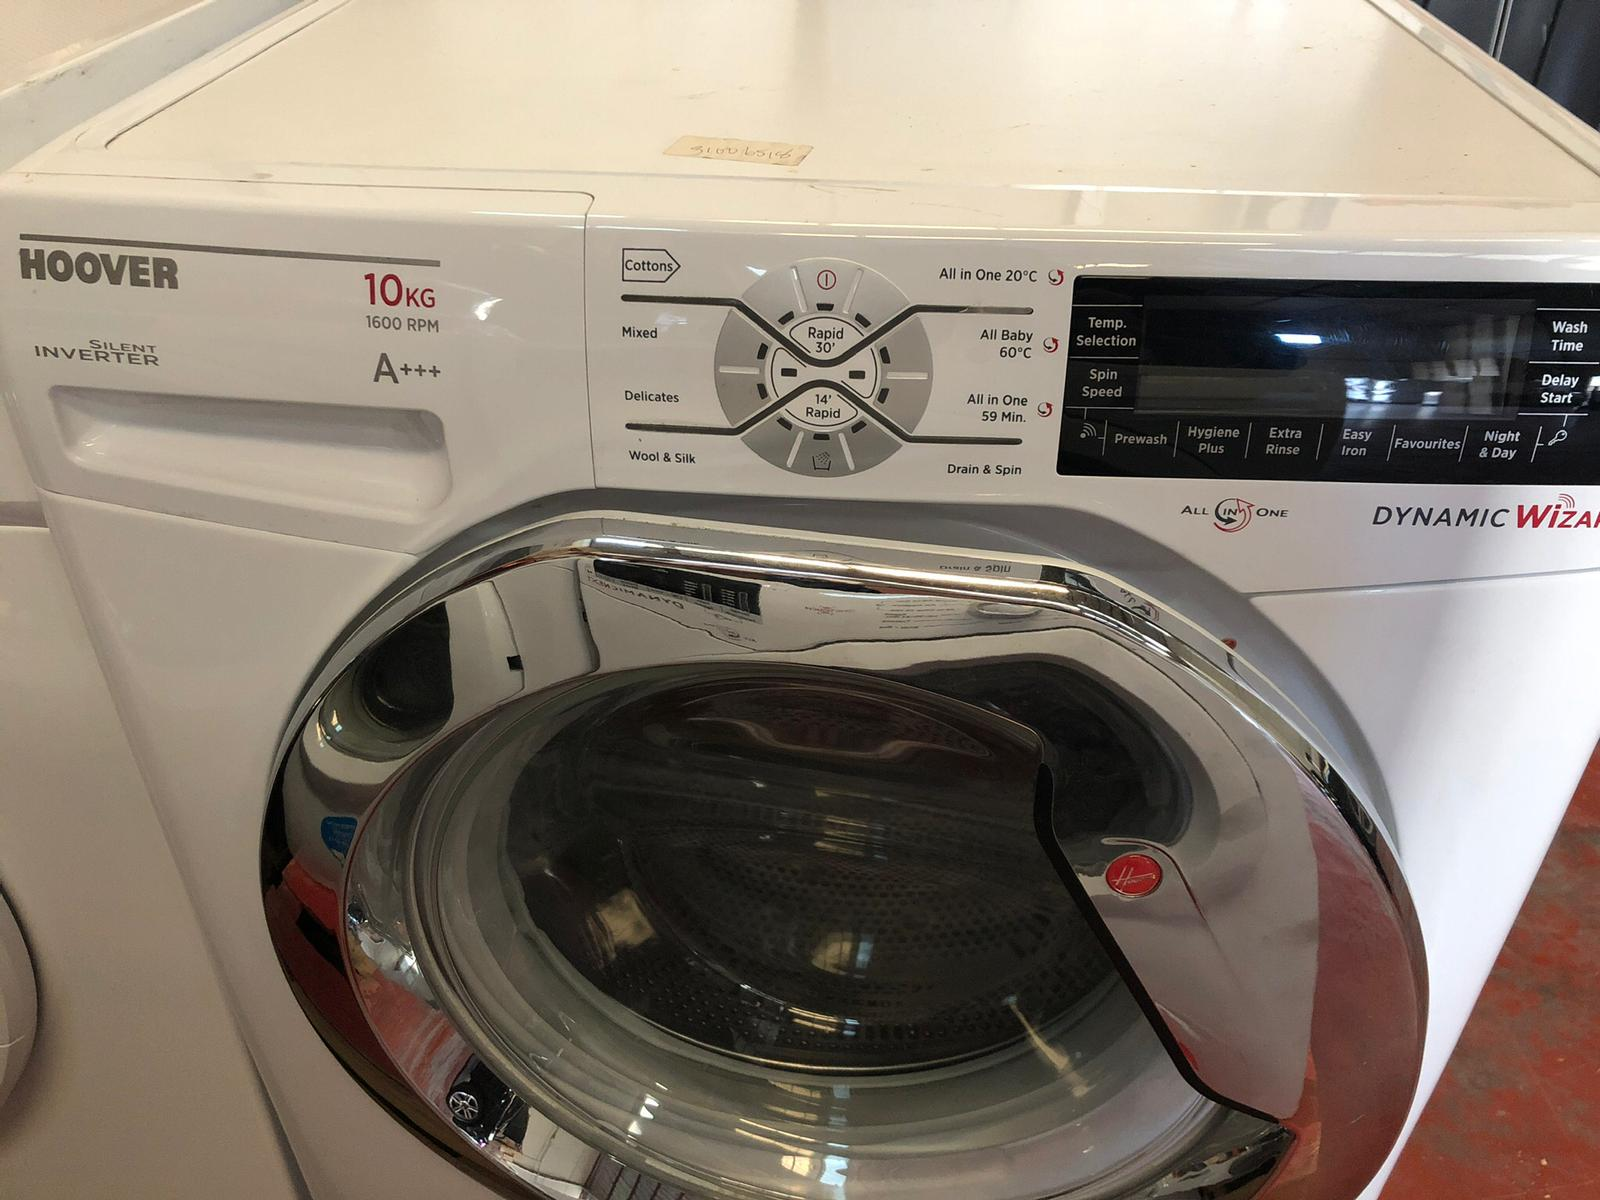 Stocklot washing machines - Stock Italy Srl